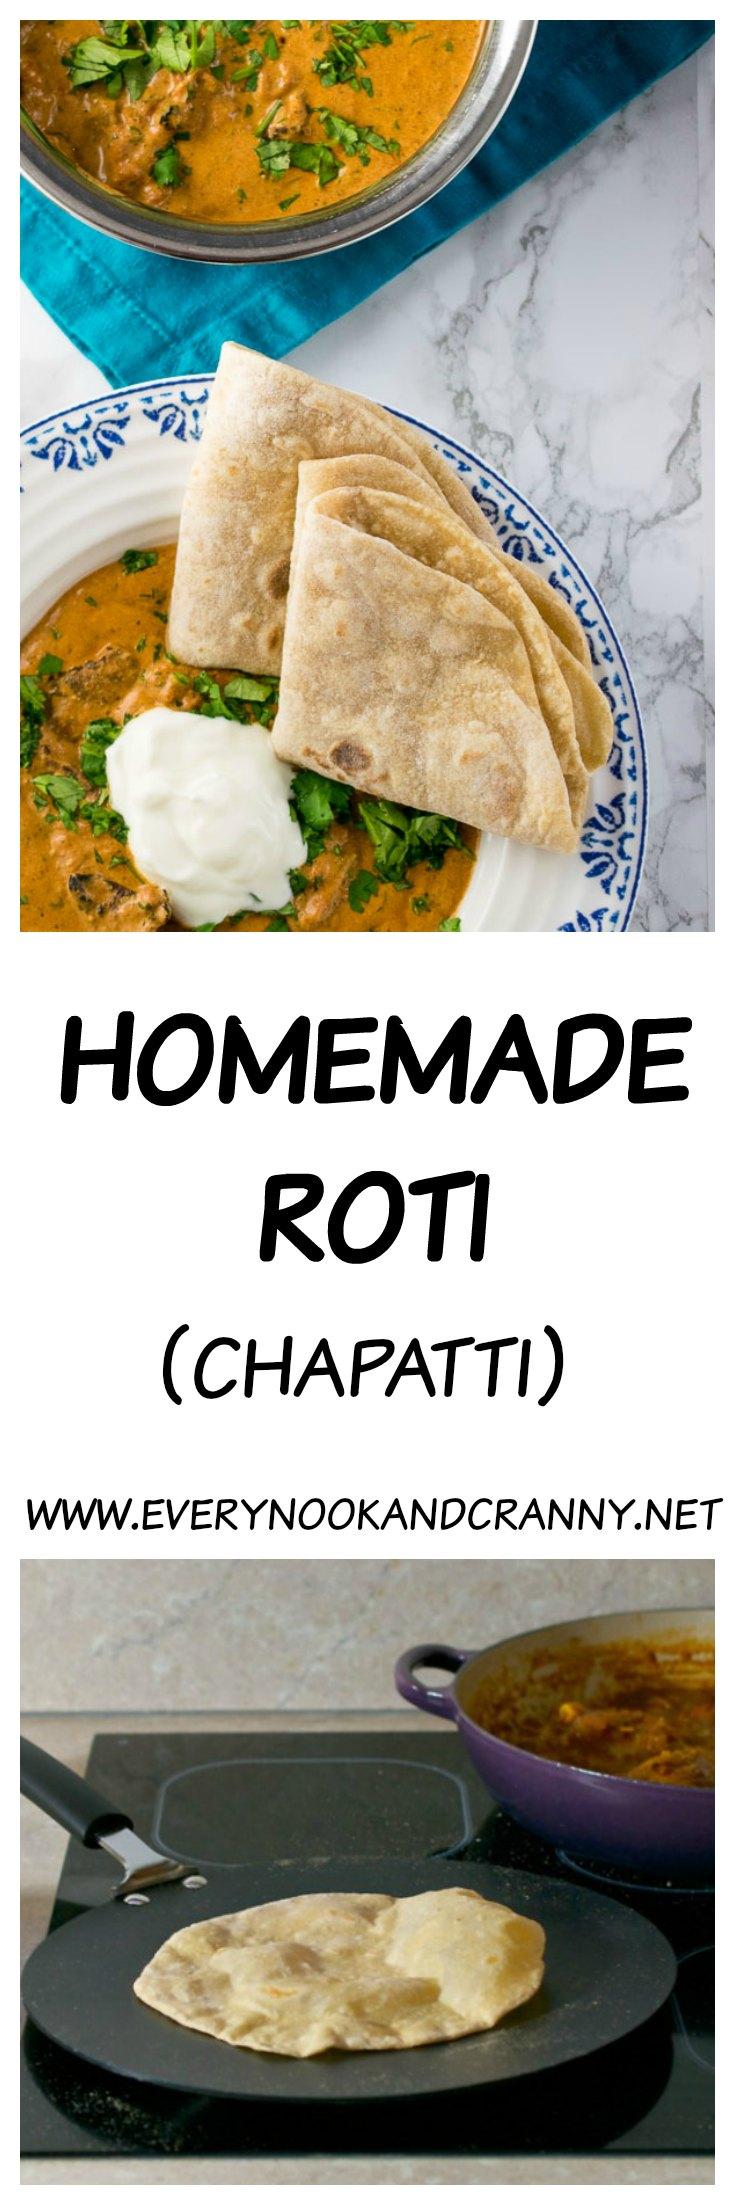 How to make roti (chapatti)